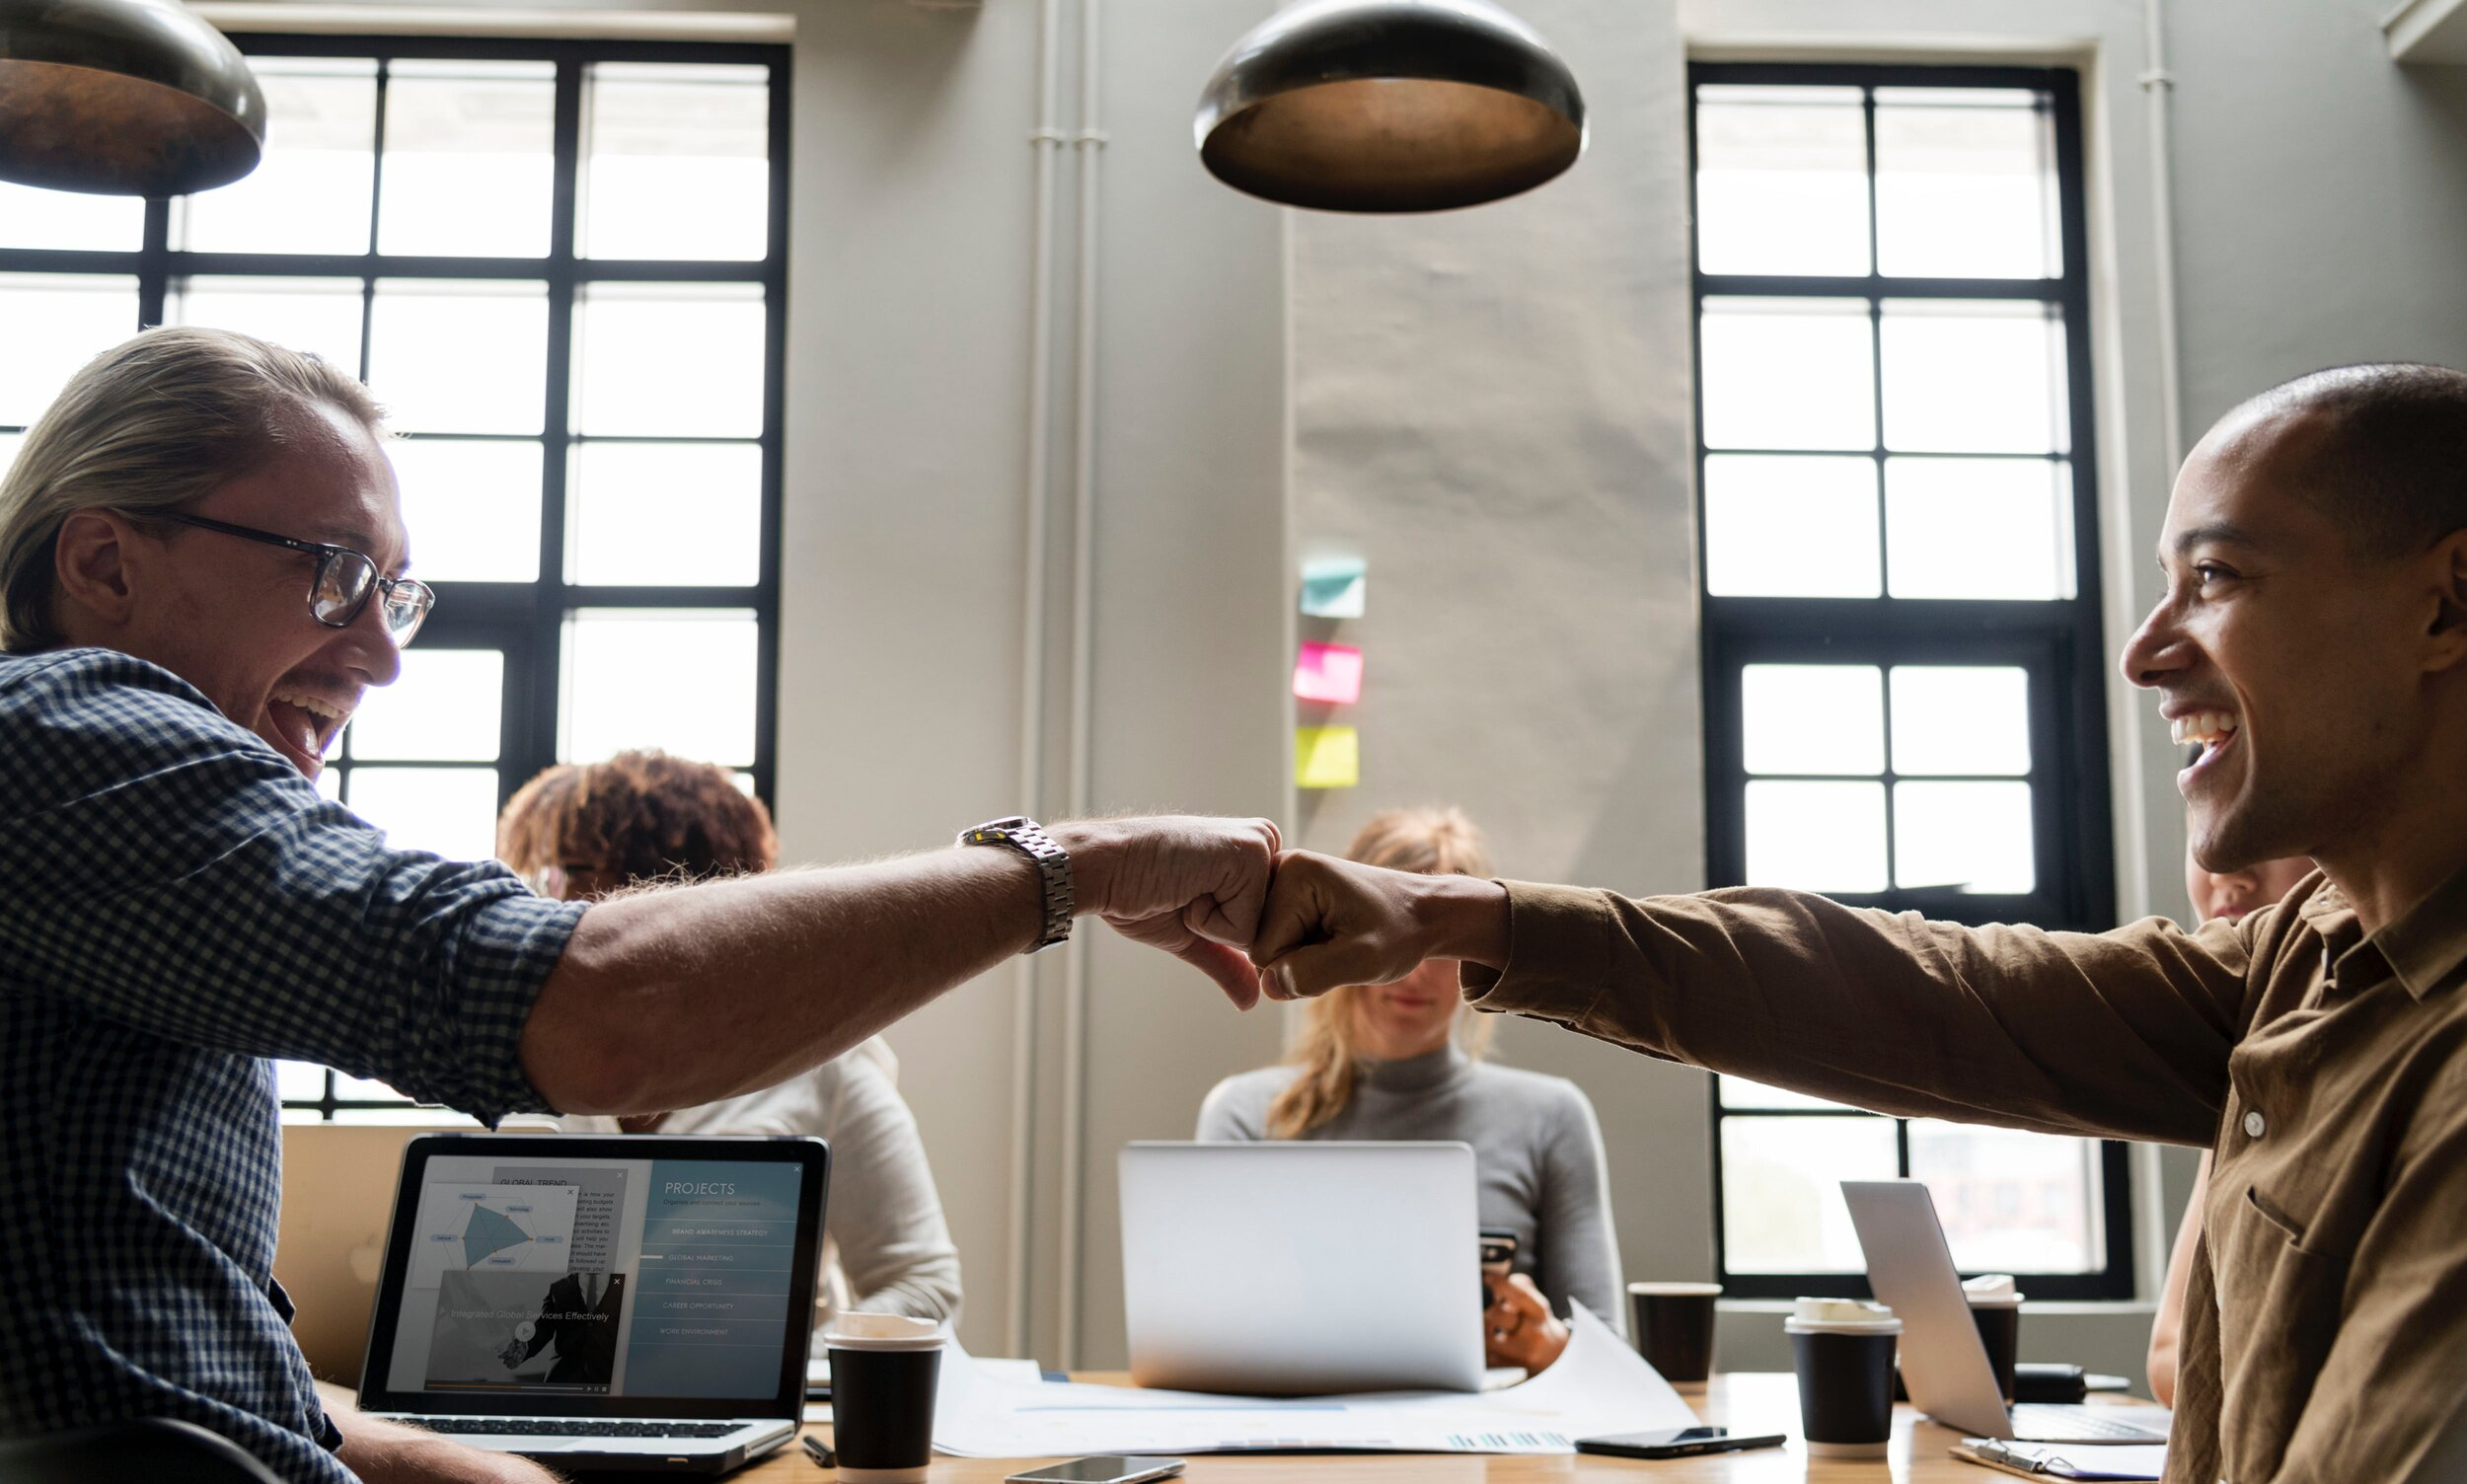 teamwork-leadership-training-business-coaching-Minneapolis.jpg